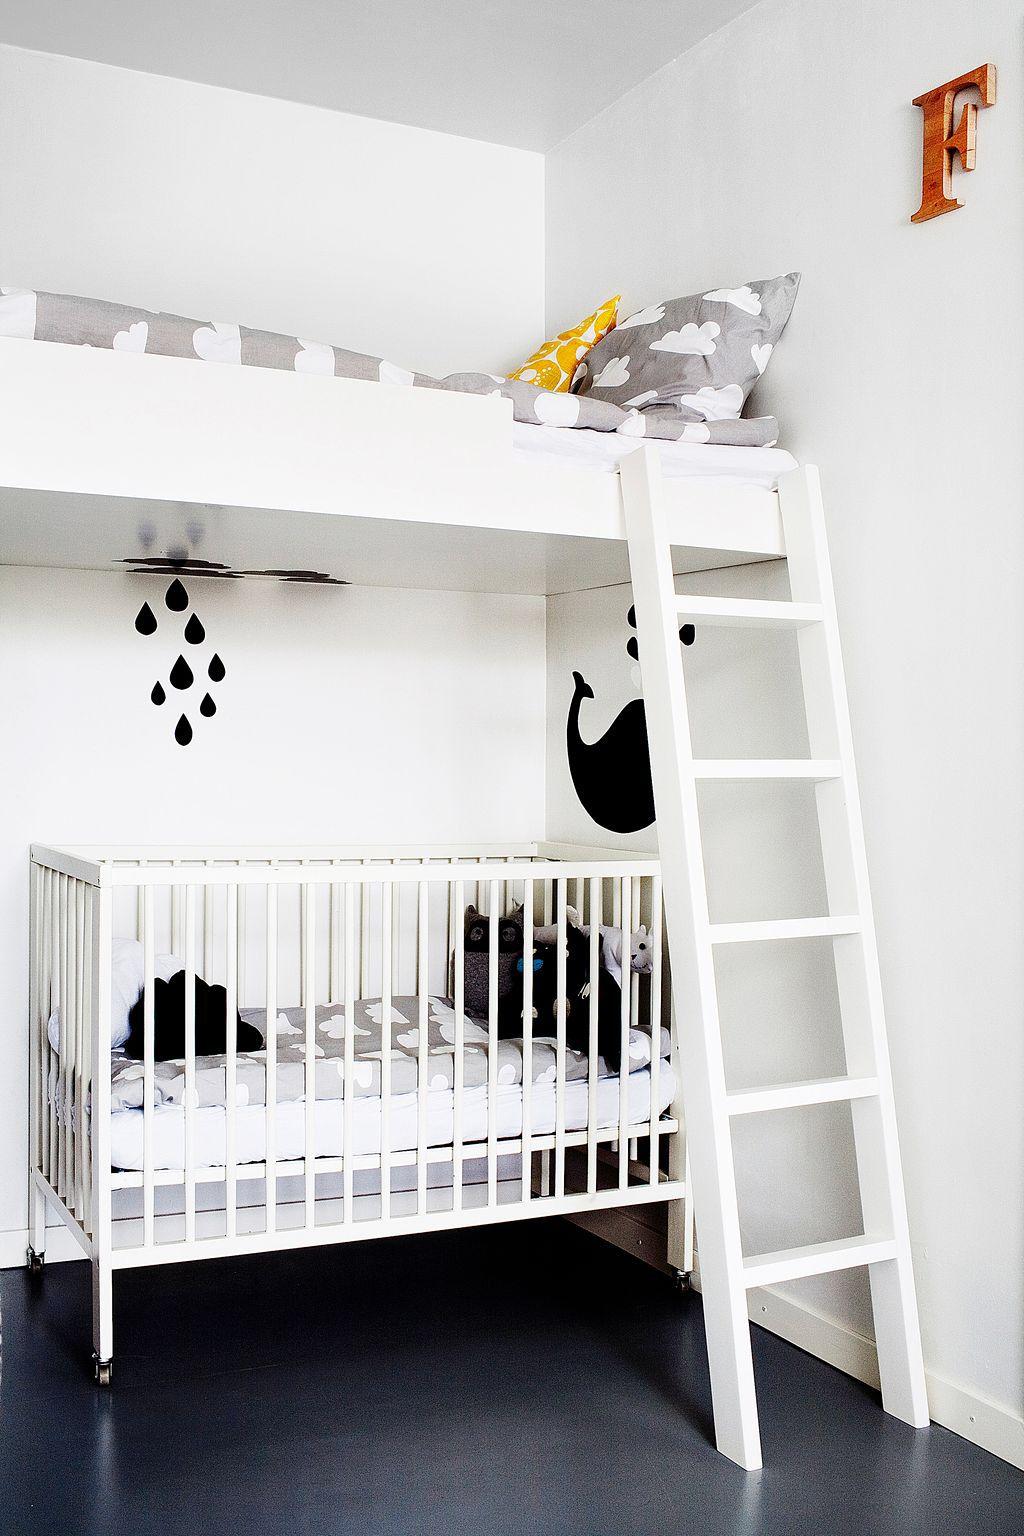 Cot Under High Sleeper Kids Rooms Shared Shared Kids Room Bunk Bed Loft